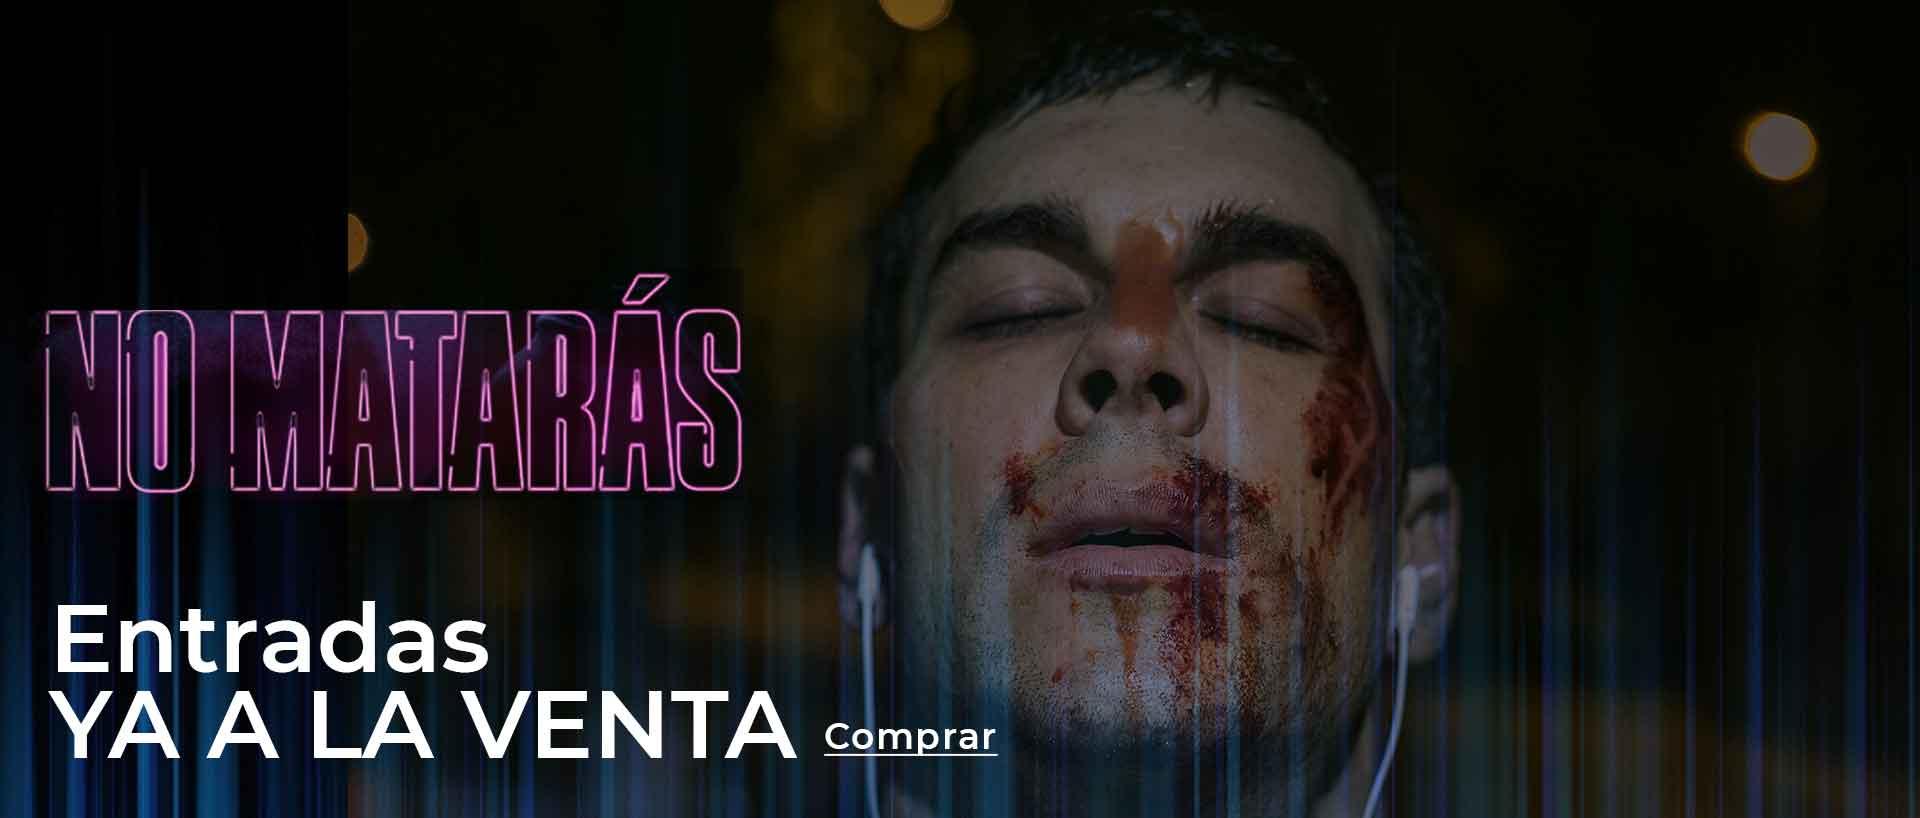 nomataras_caratula.jpg